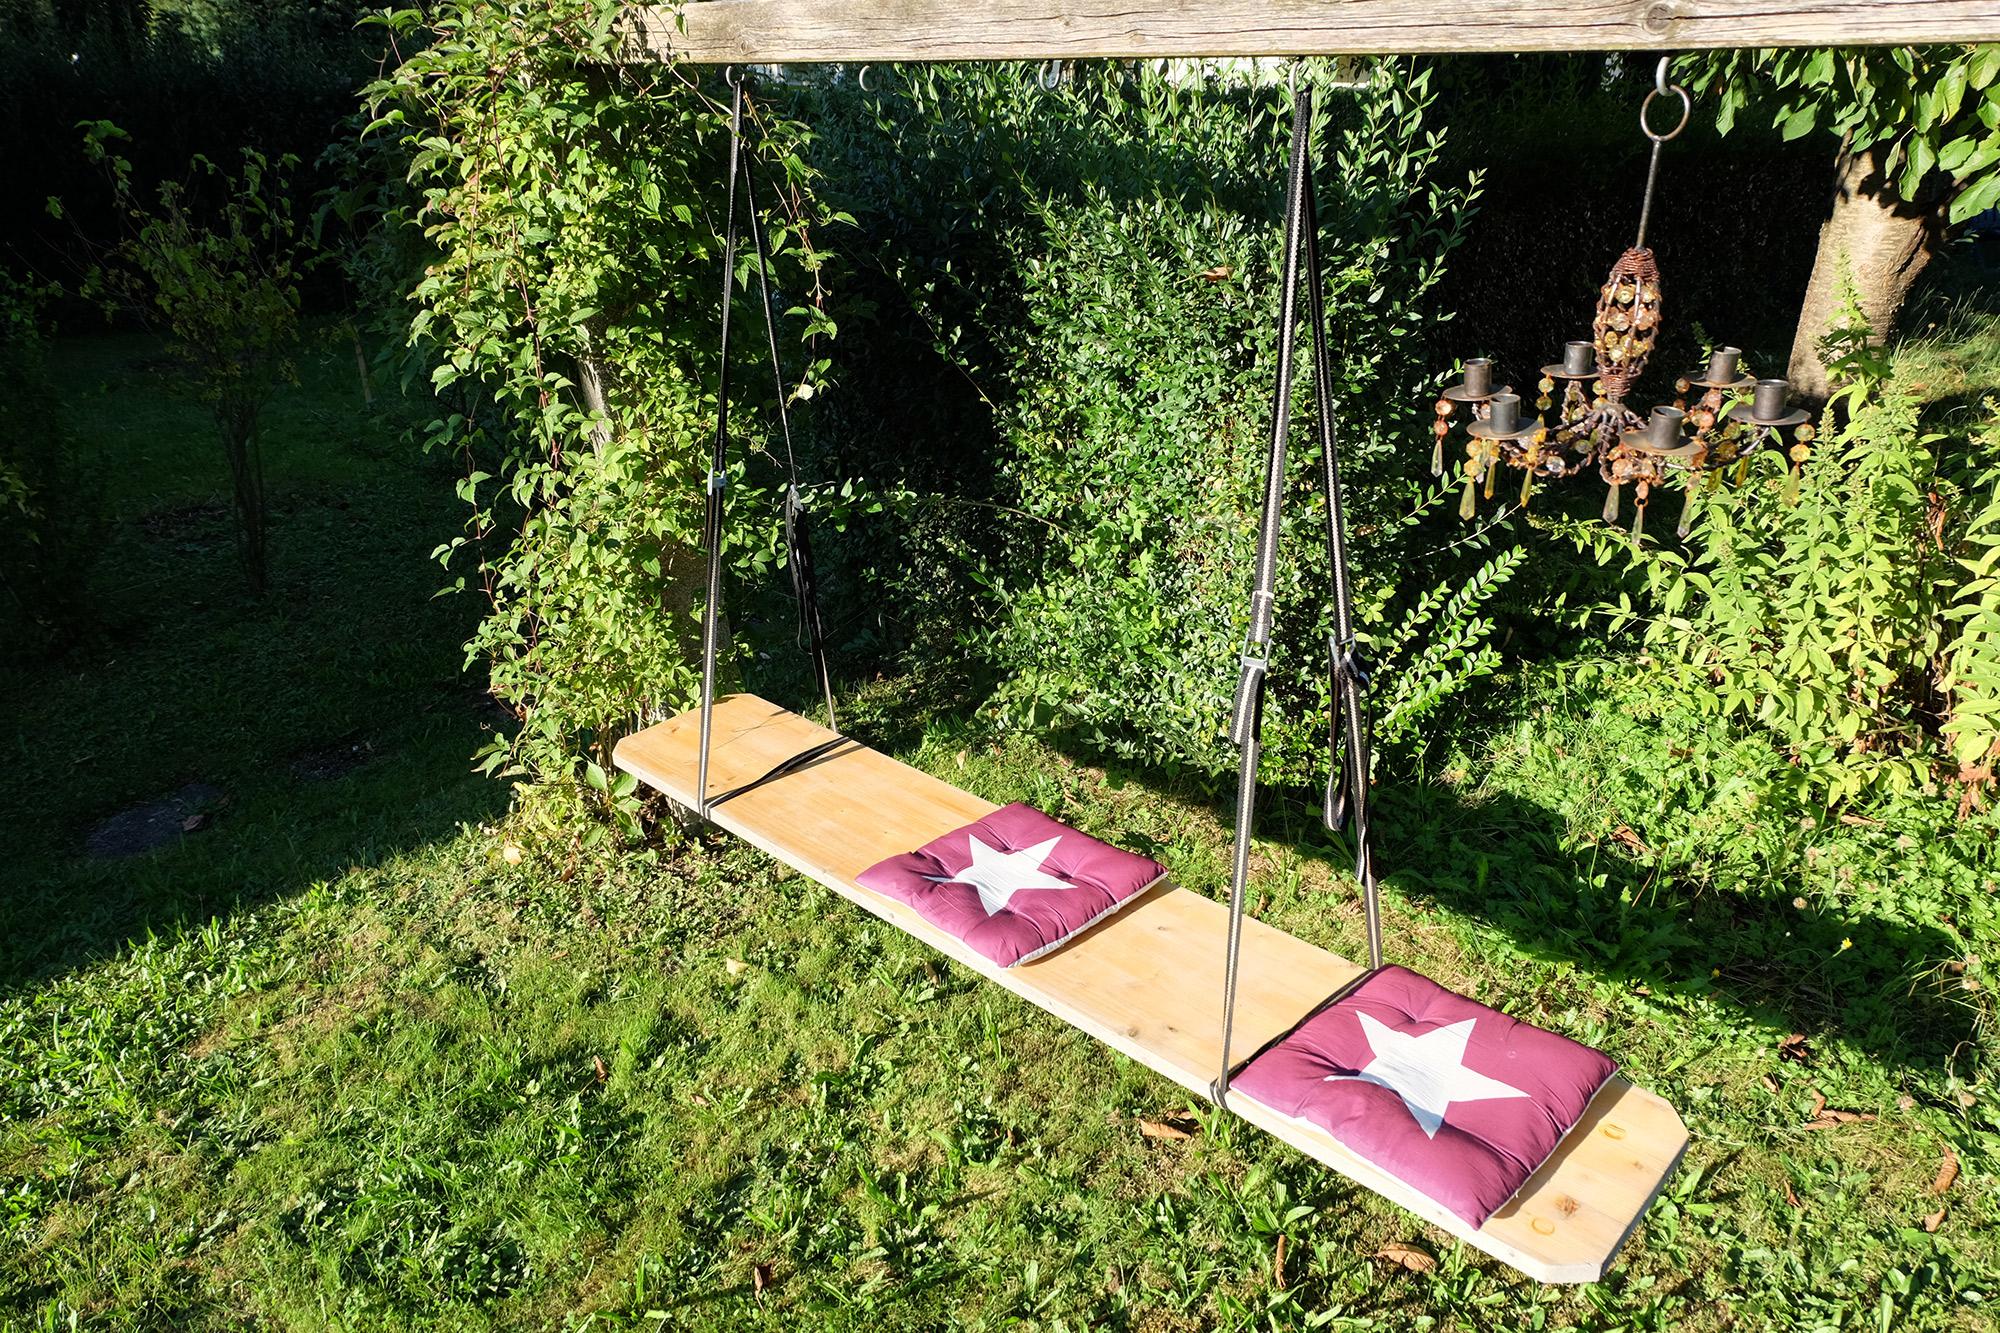 bolly-wood-swing-modern-design-chair-bench-furniture-board-contemporary-art-arts-fineart-gallery-museum-manfred-kili-kielnhofer-designer-7964